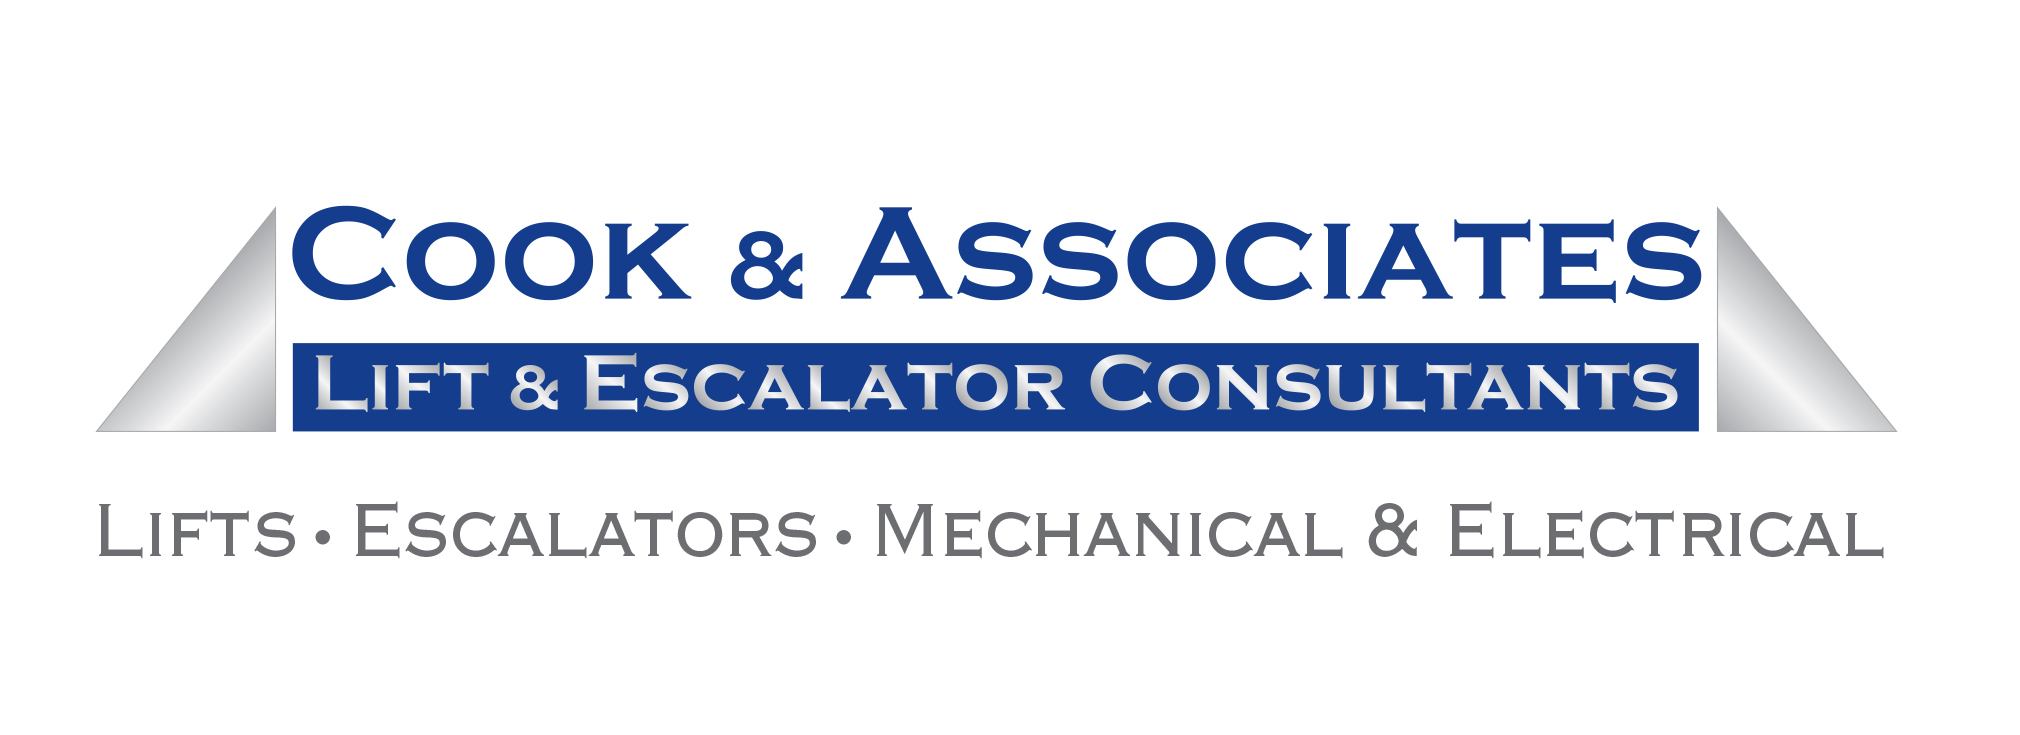 Cook Associates